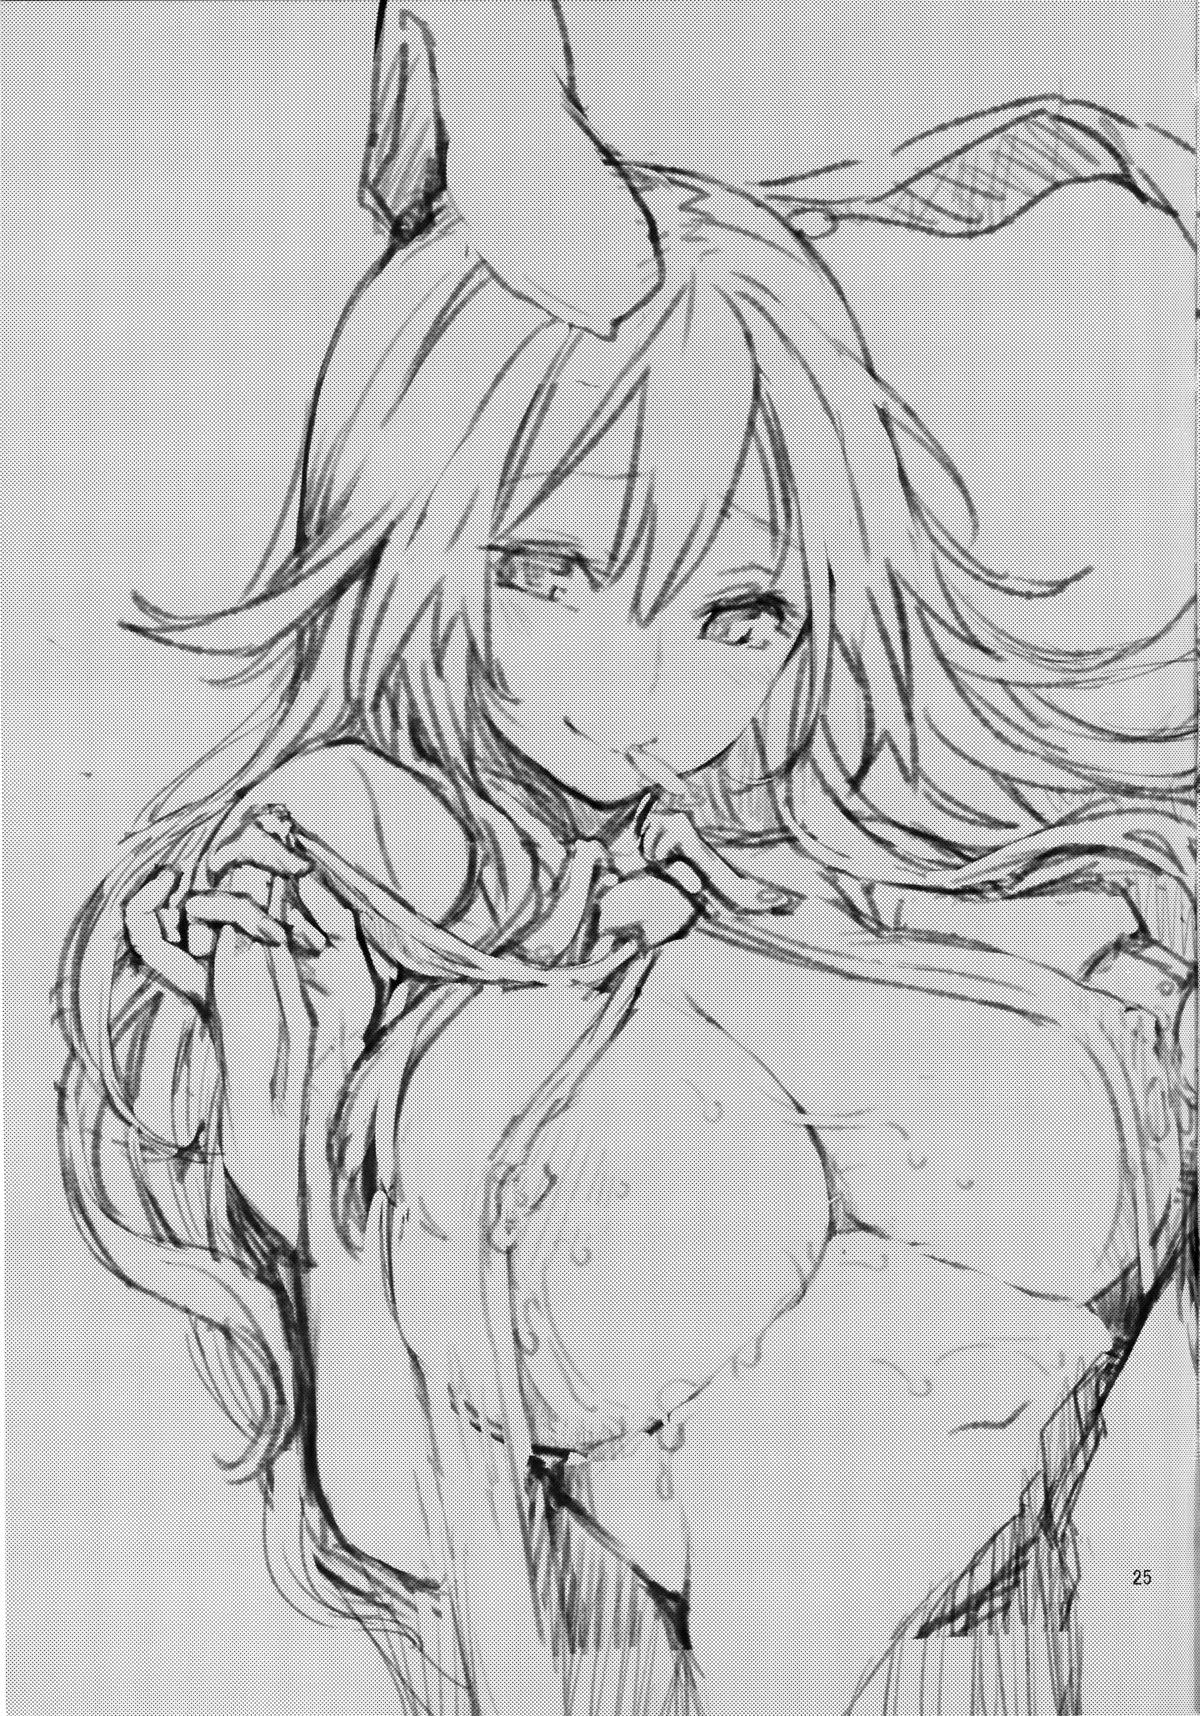 (C89) [Anmitsuyomogitei (Michiking)] Suwasete Kudasai Udonge-mama! | Let Me Suck On Them, Udonge-Mama! (Touhou Project) [English] [PSYN + Facedesk] 24